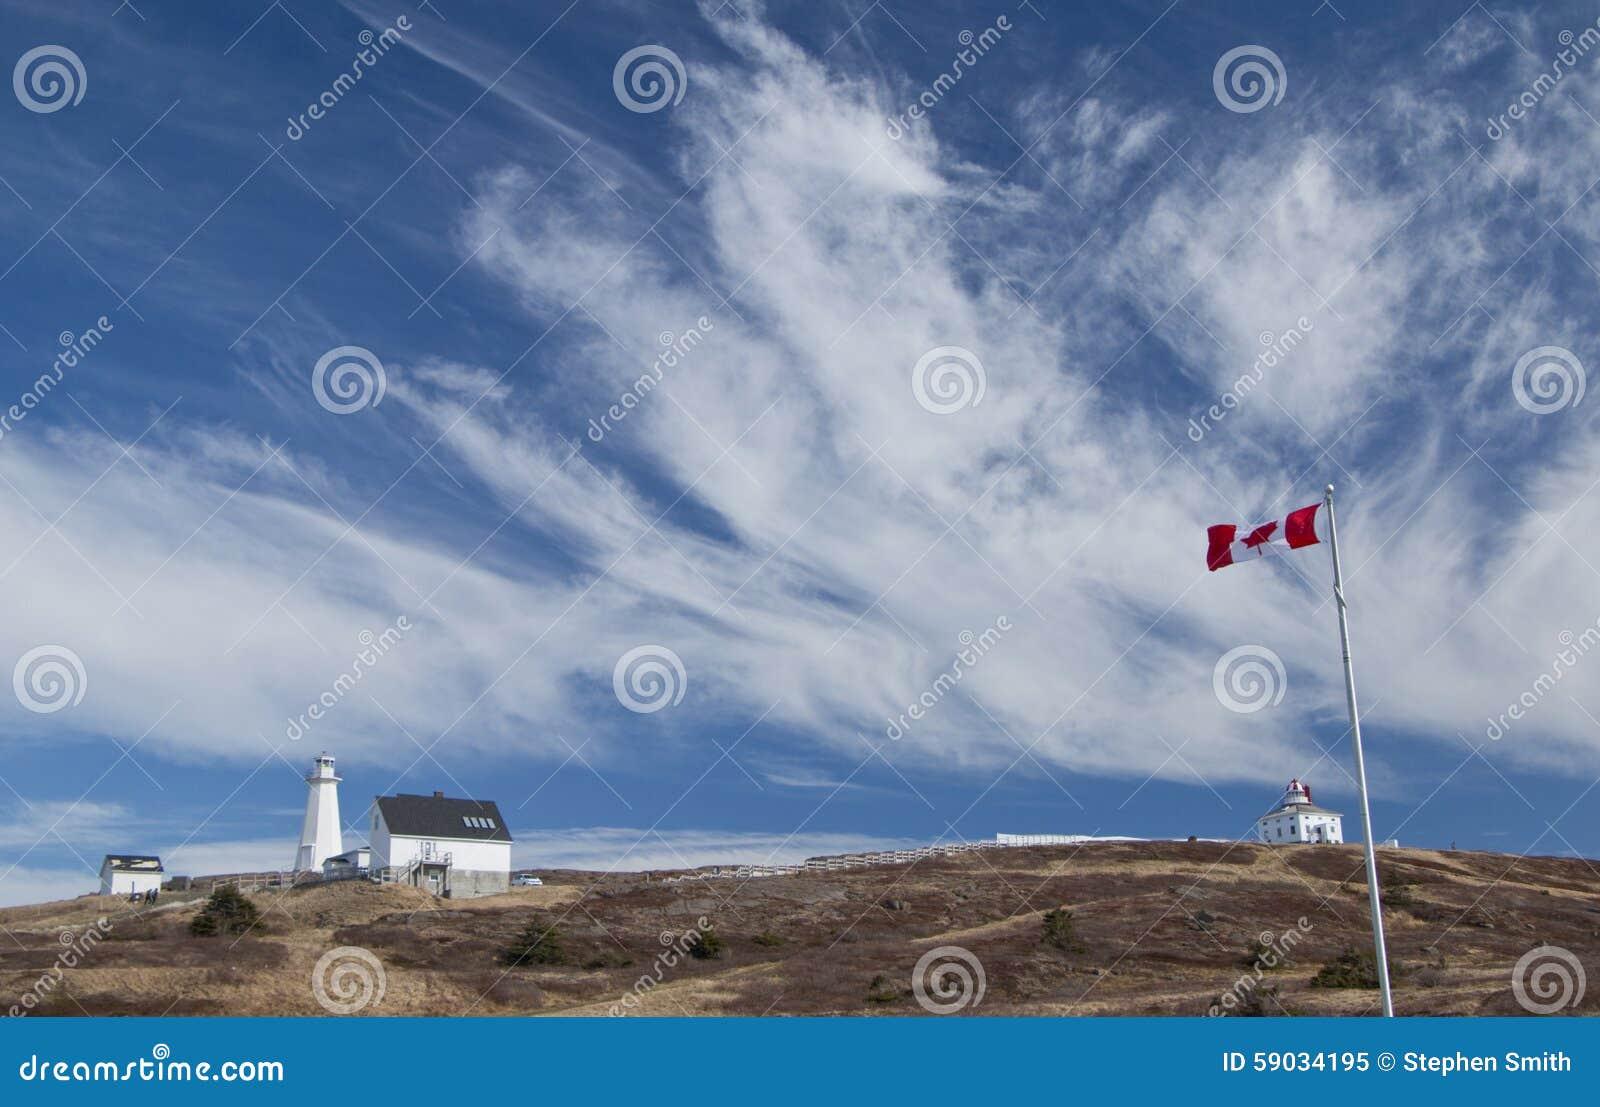 Kanada-Flagge an der Kap-Stangen-Leuchtturm-Staatsangehörig-historischen Stätte